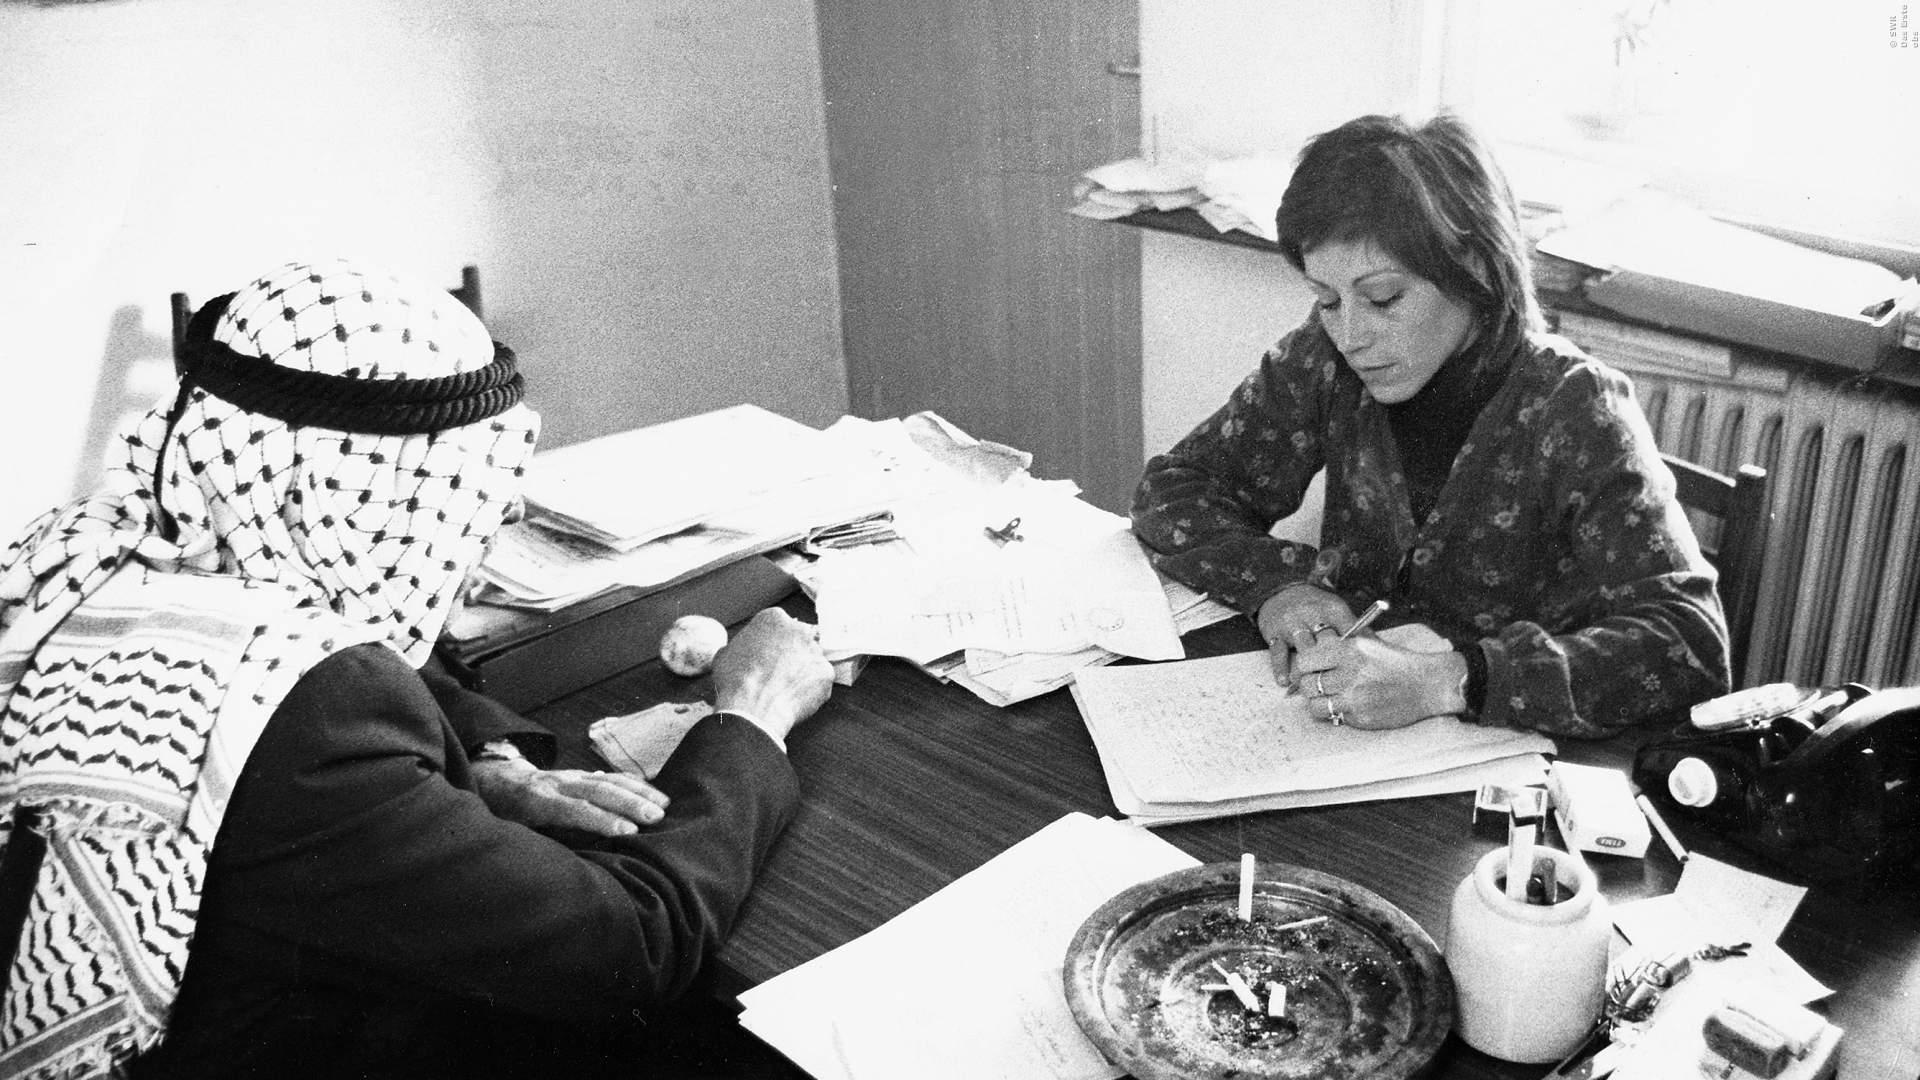 Lea Tsemel, Anwältin - Dokumentation im Ersten